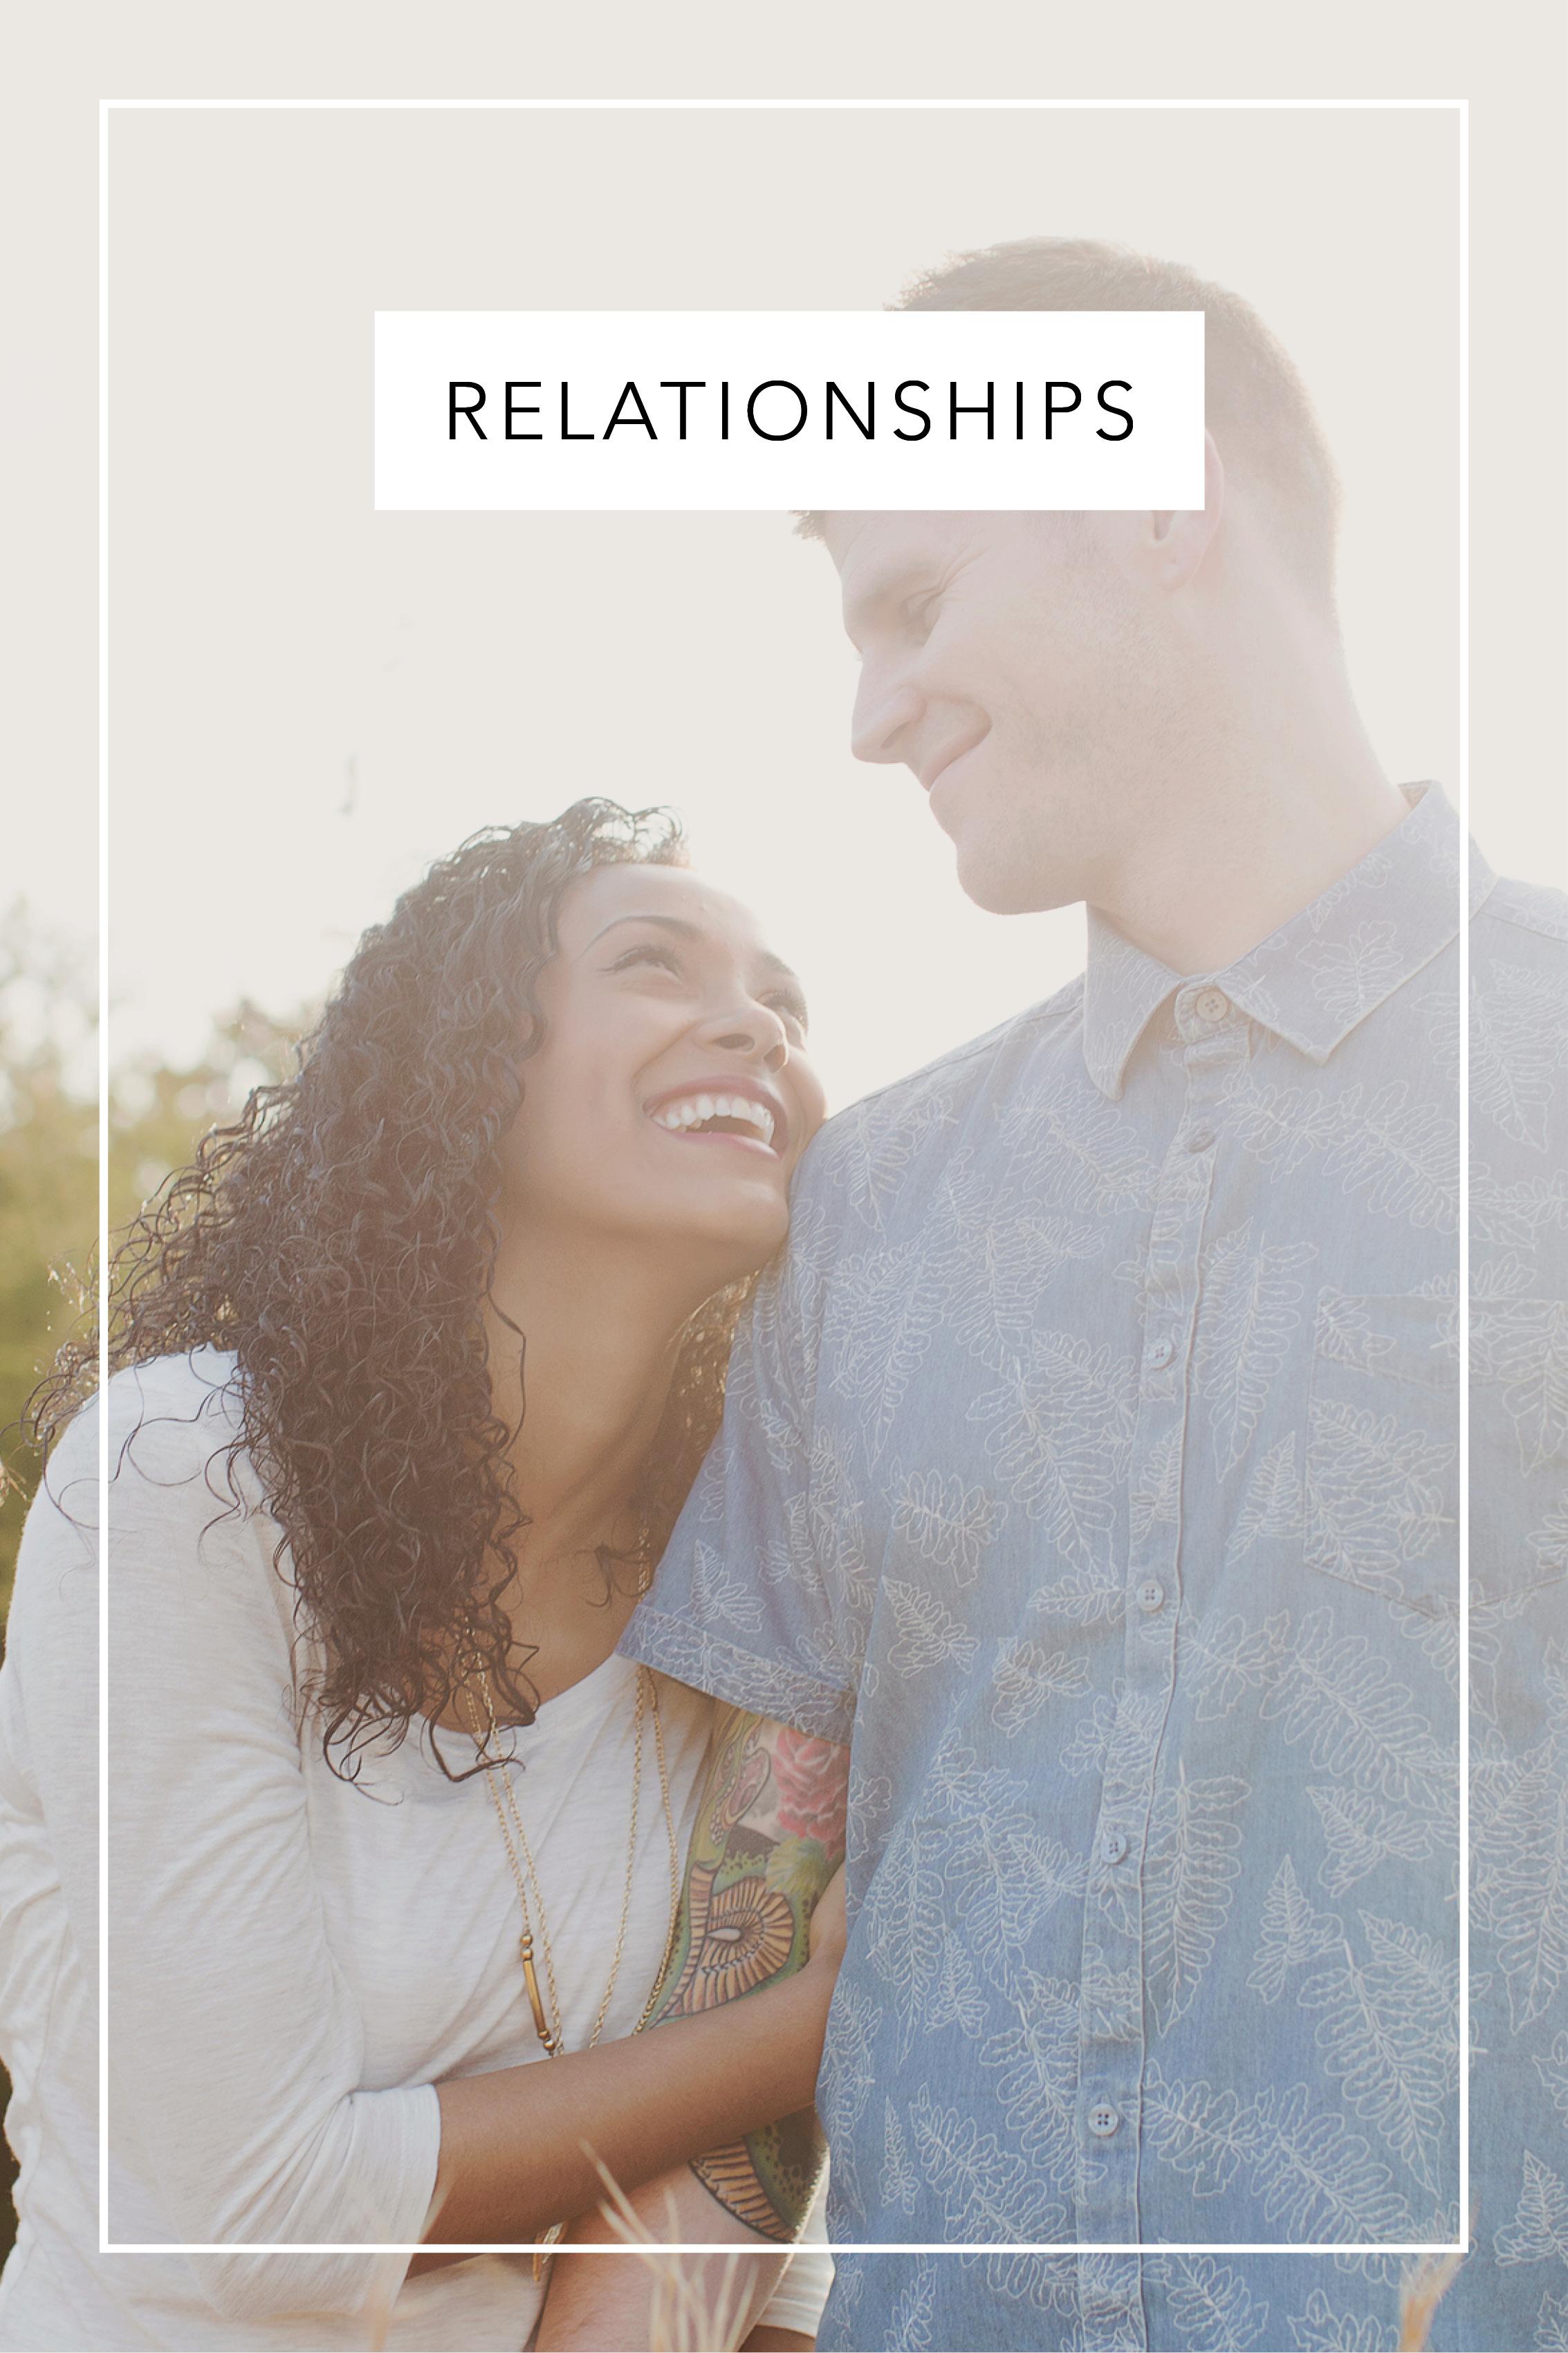 smallseed_relationships.jpg